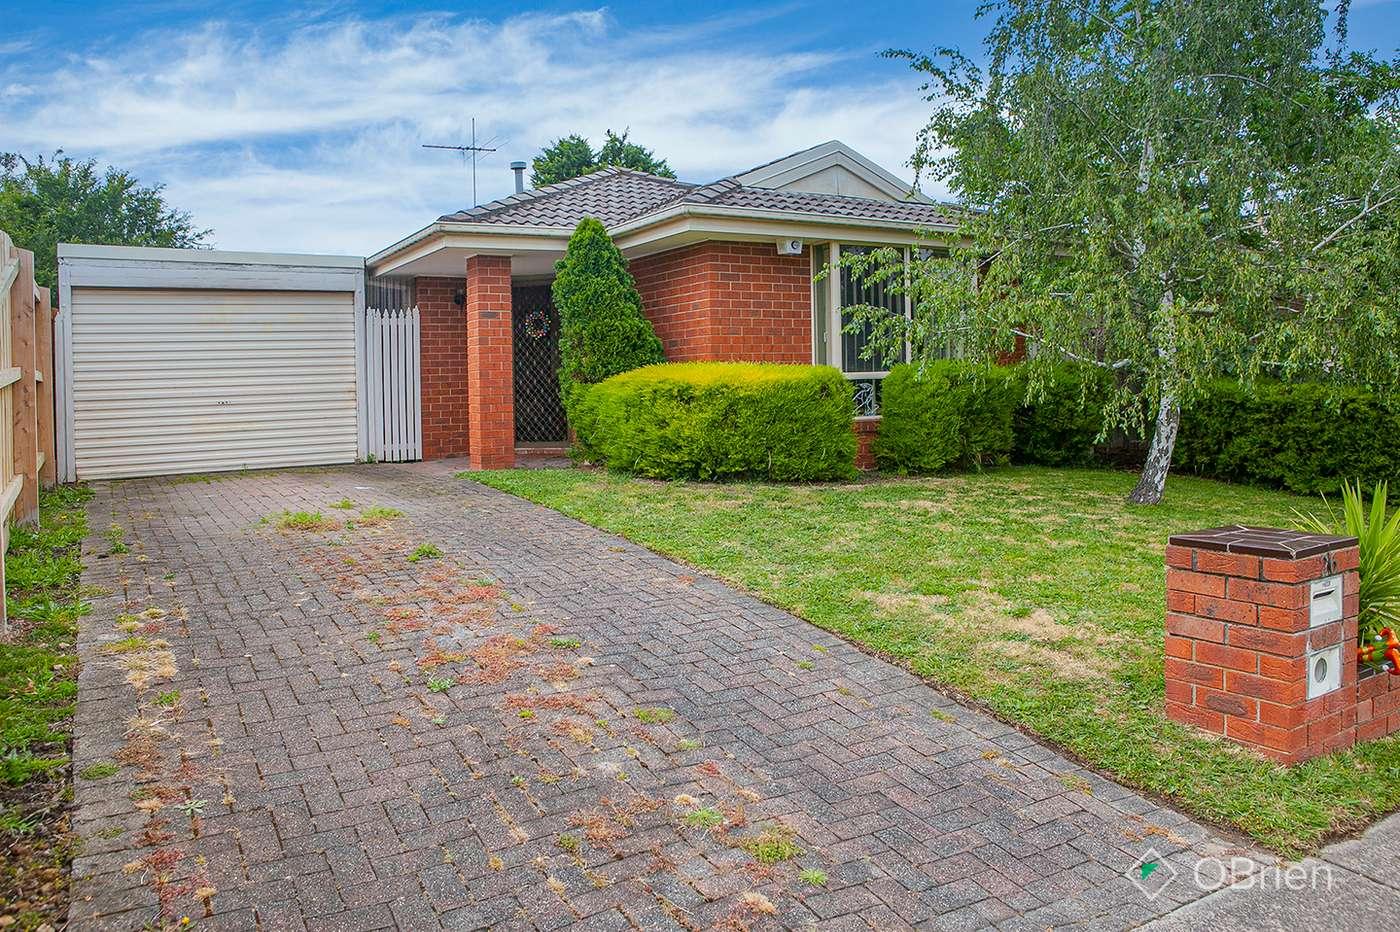 Main view of Homely house listing, 26 Euroa Avenue, Berwick, VIC 3806